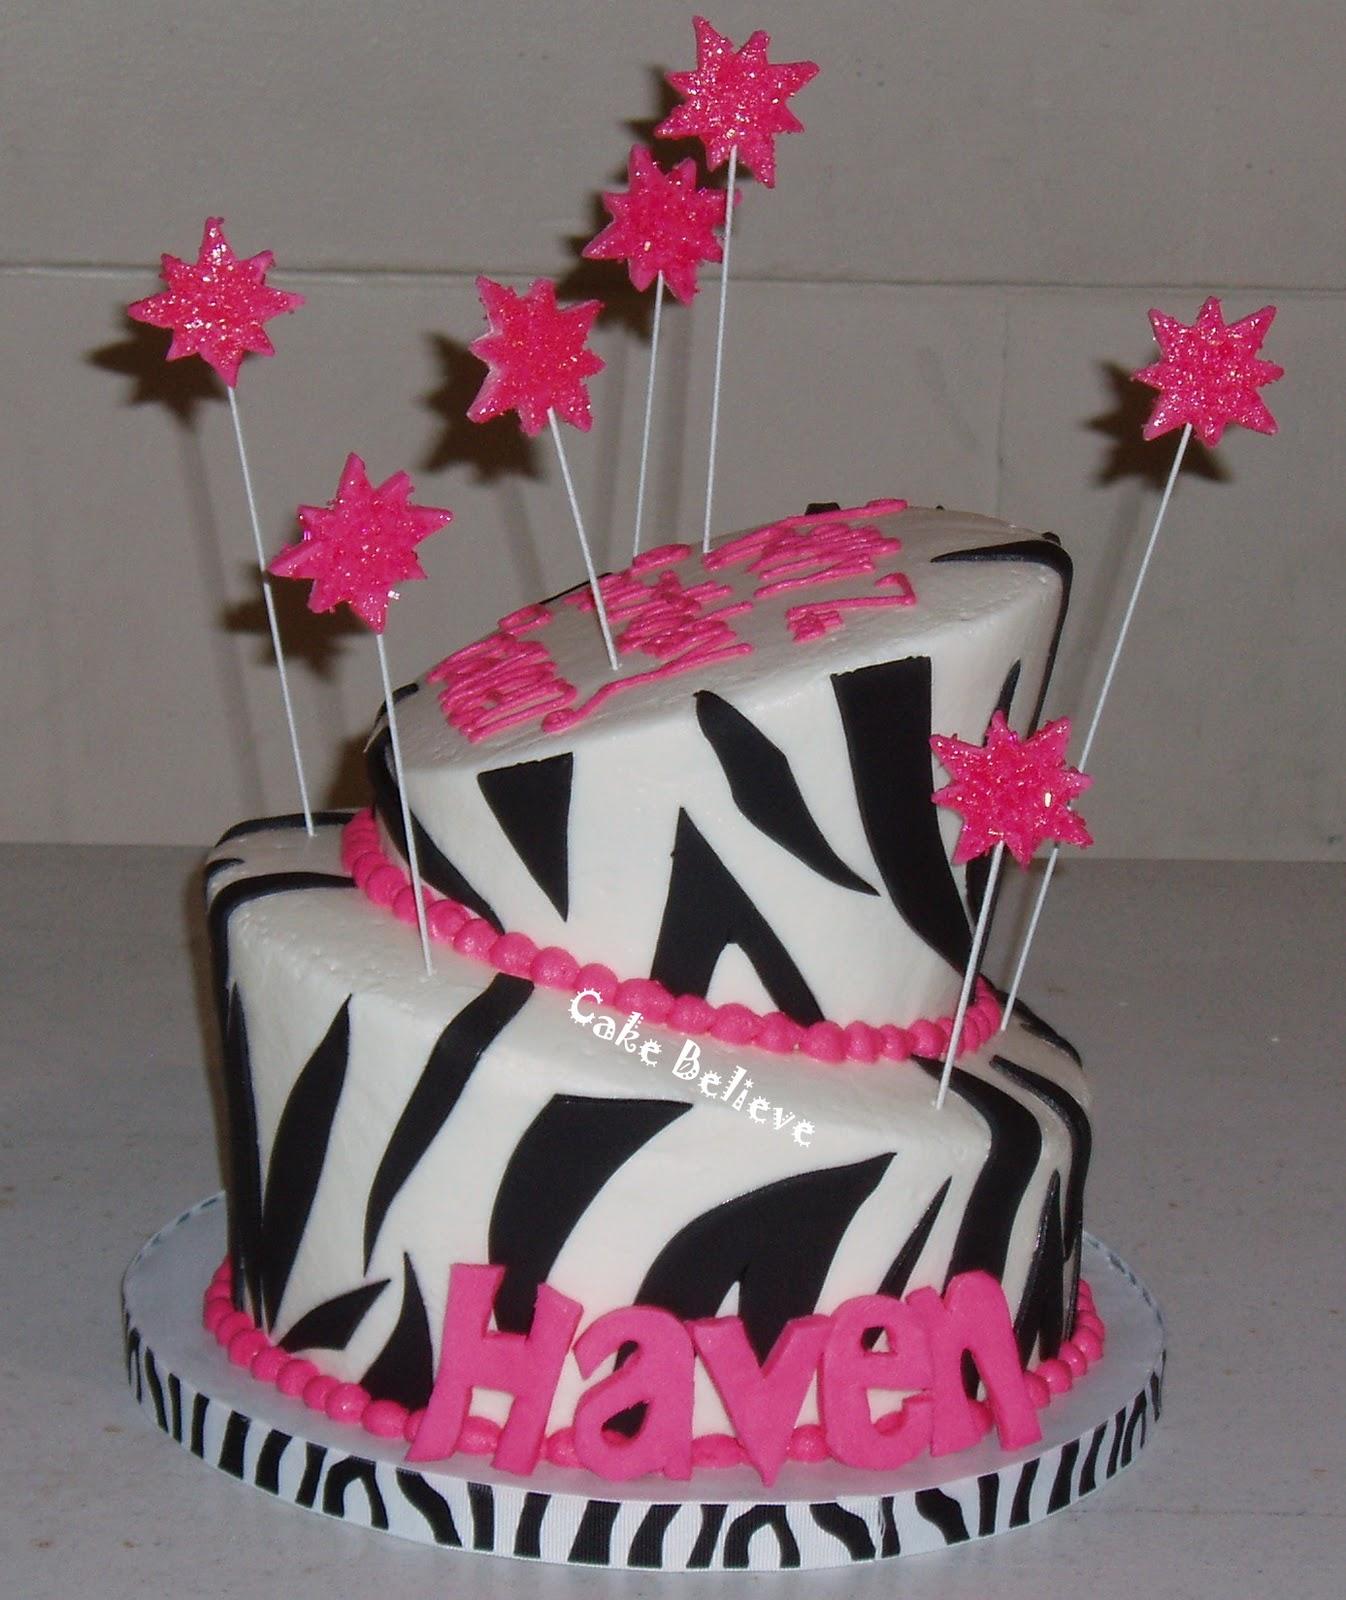 Cake Believe: Topsy Turvy Zebra Print